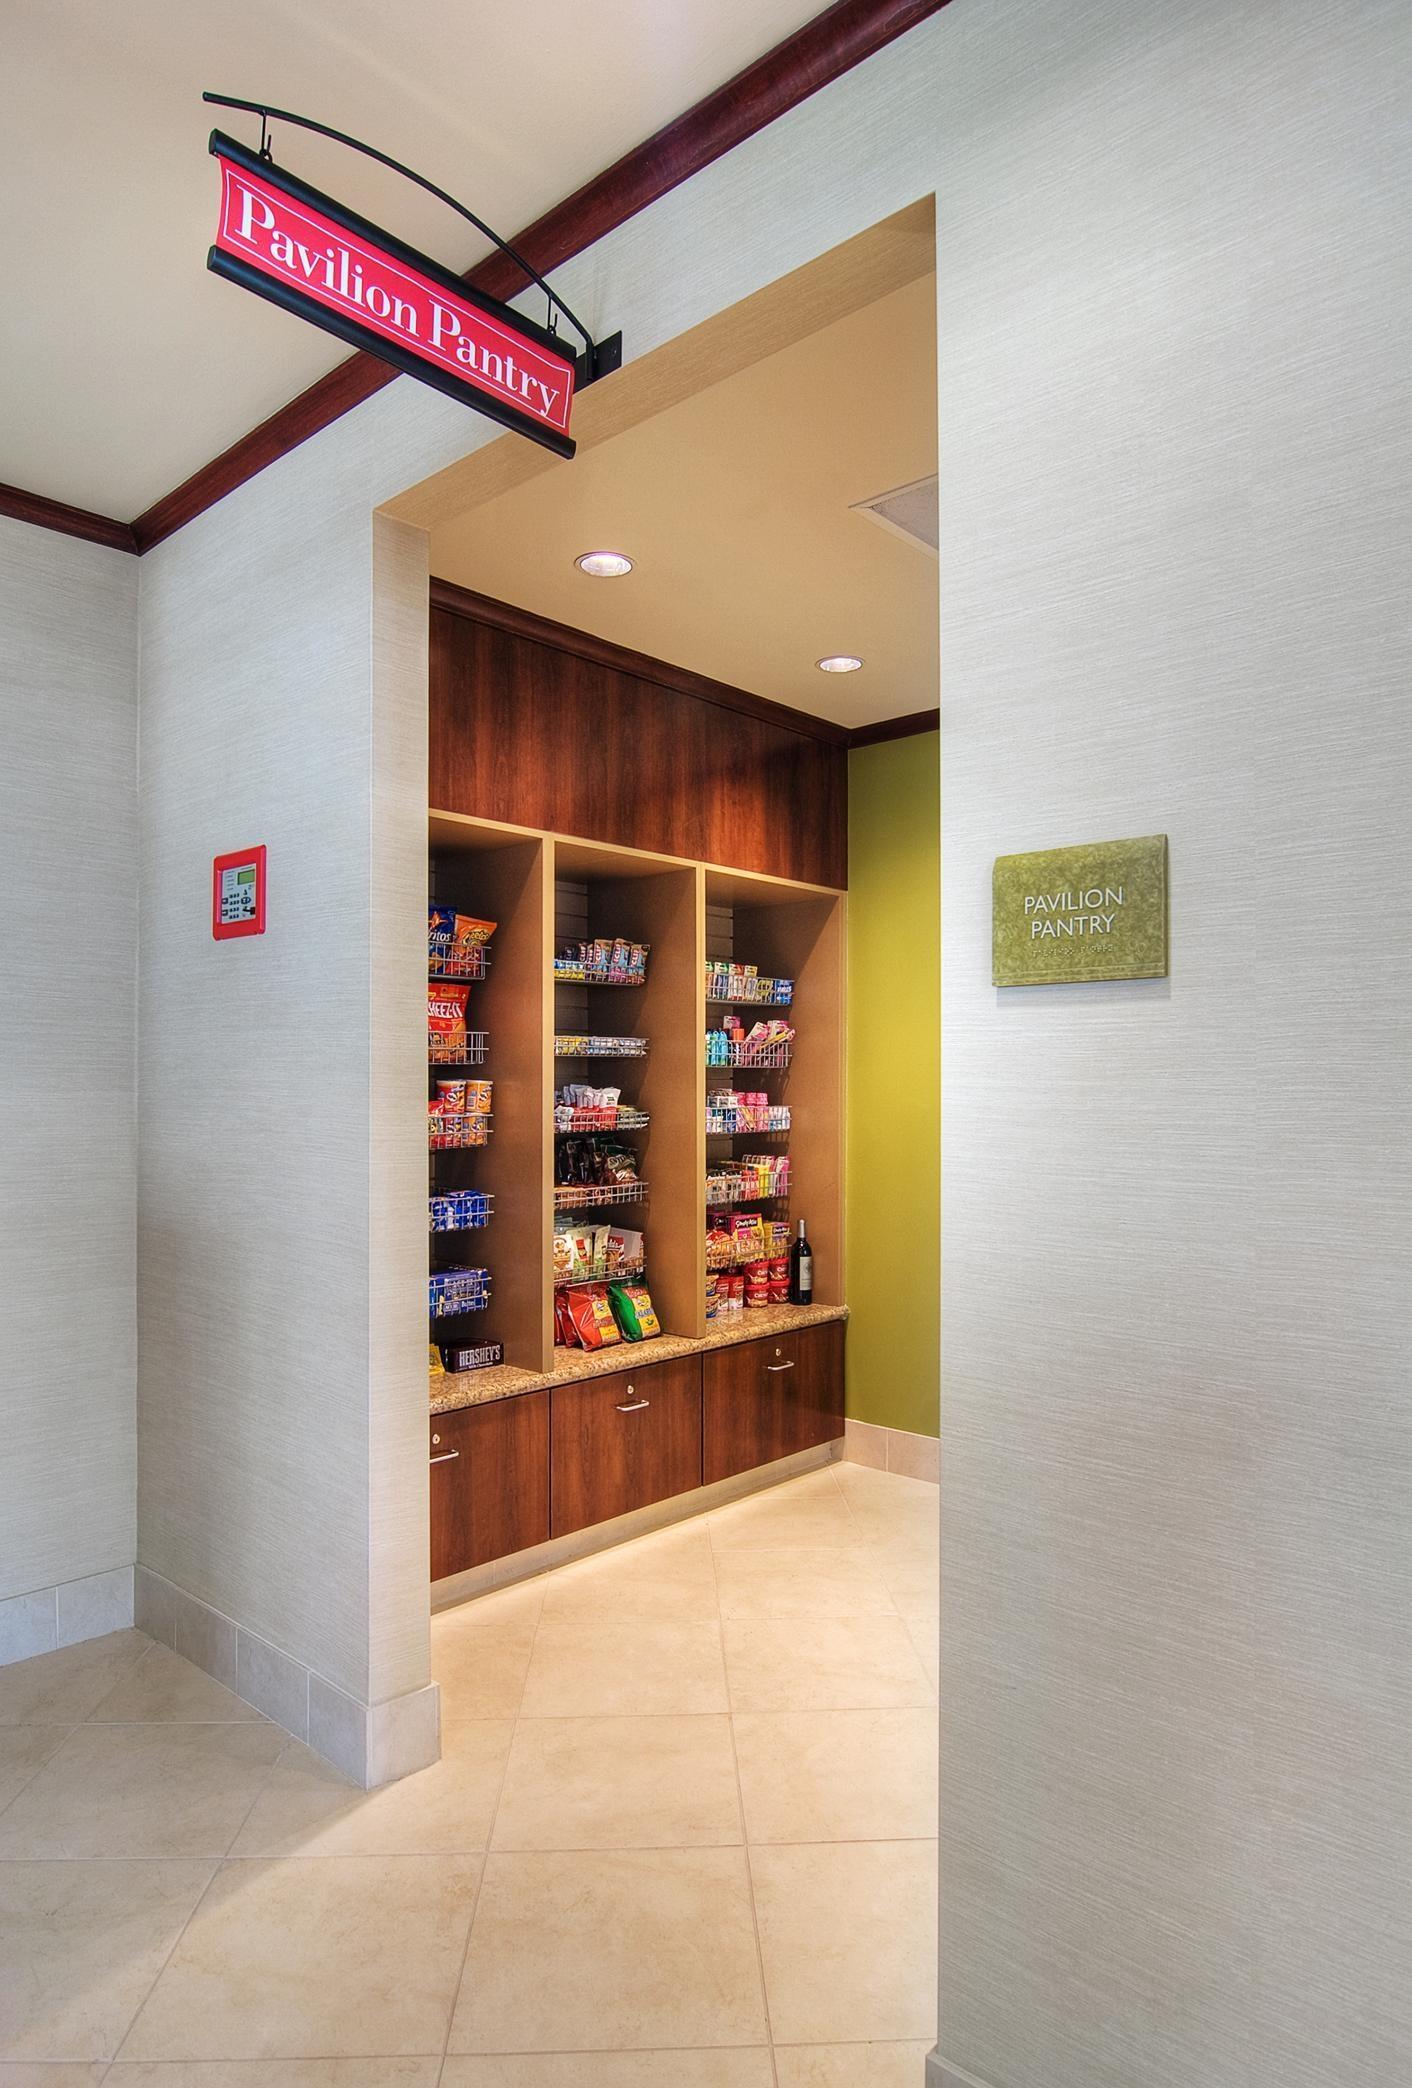 Hilton Garden Inn Houston-Pearland image 22